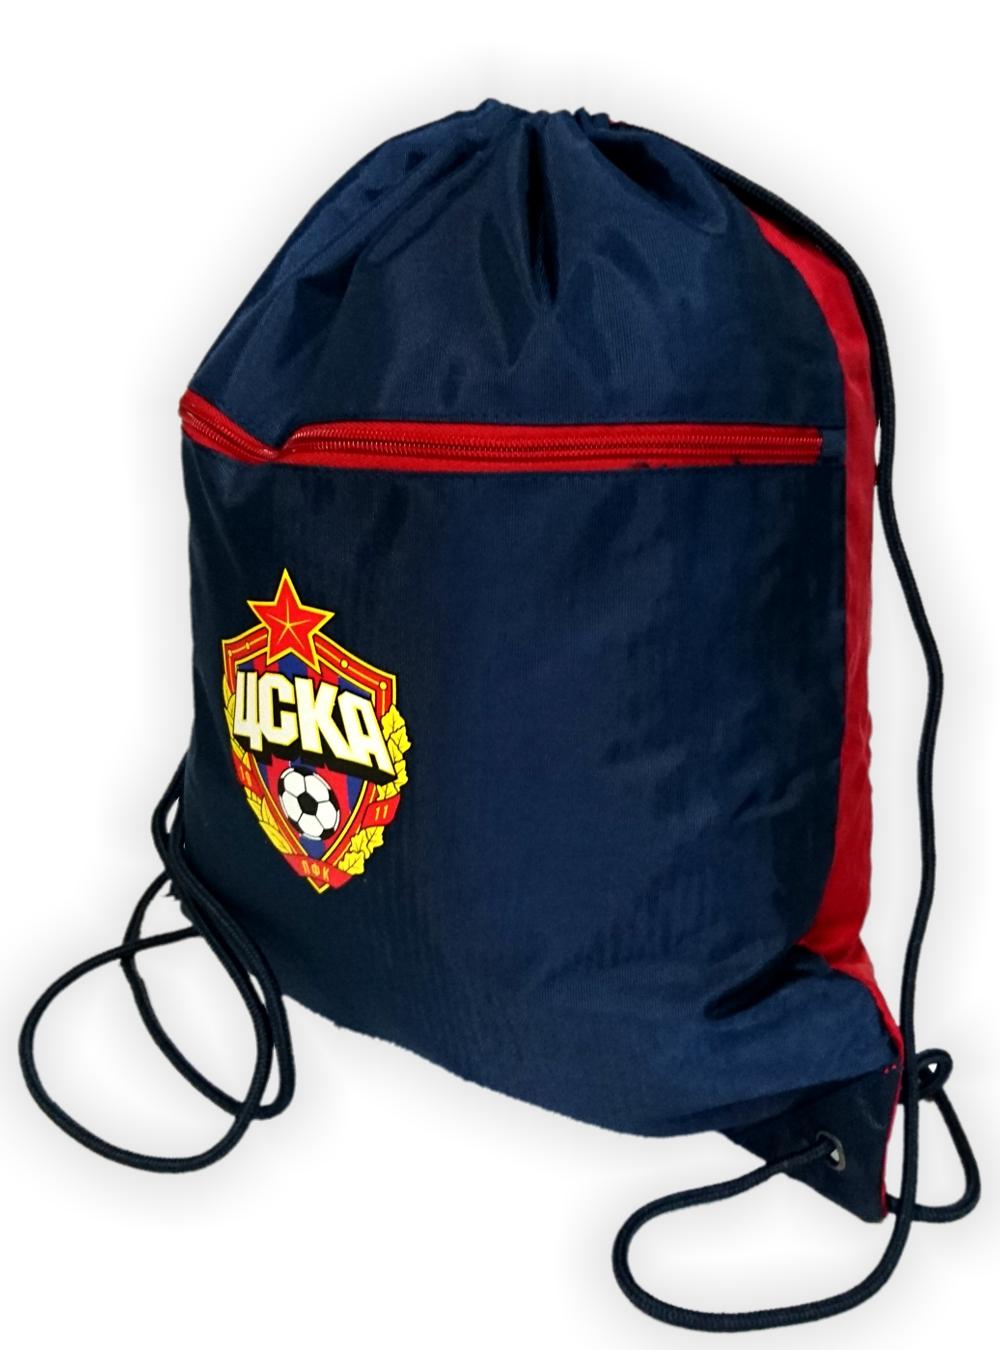 Рюкзак - мешок (красно-синий)Рюкзаки и сумки<br>Рюкзак - мешок (красно-синий)<br>